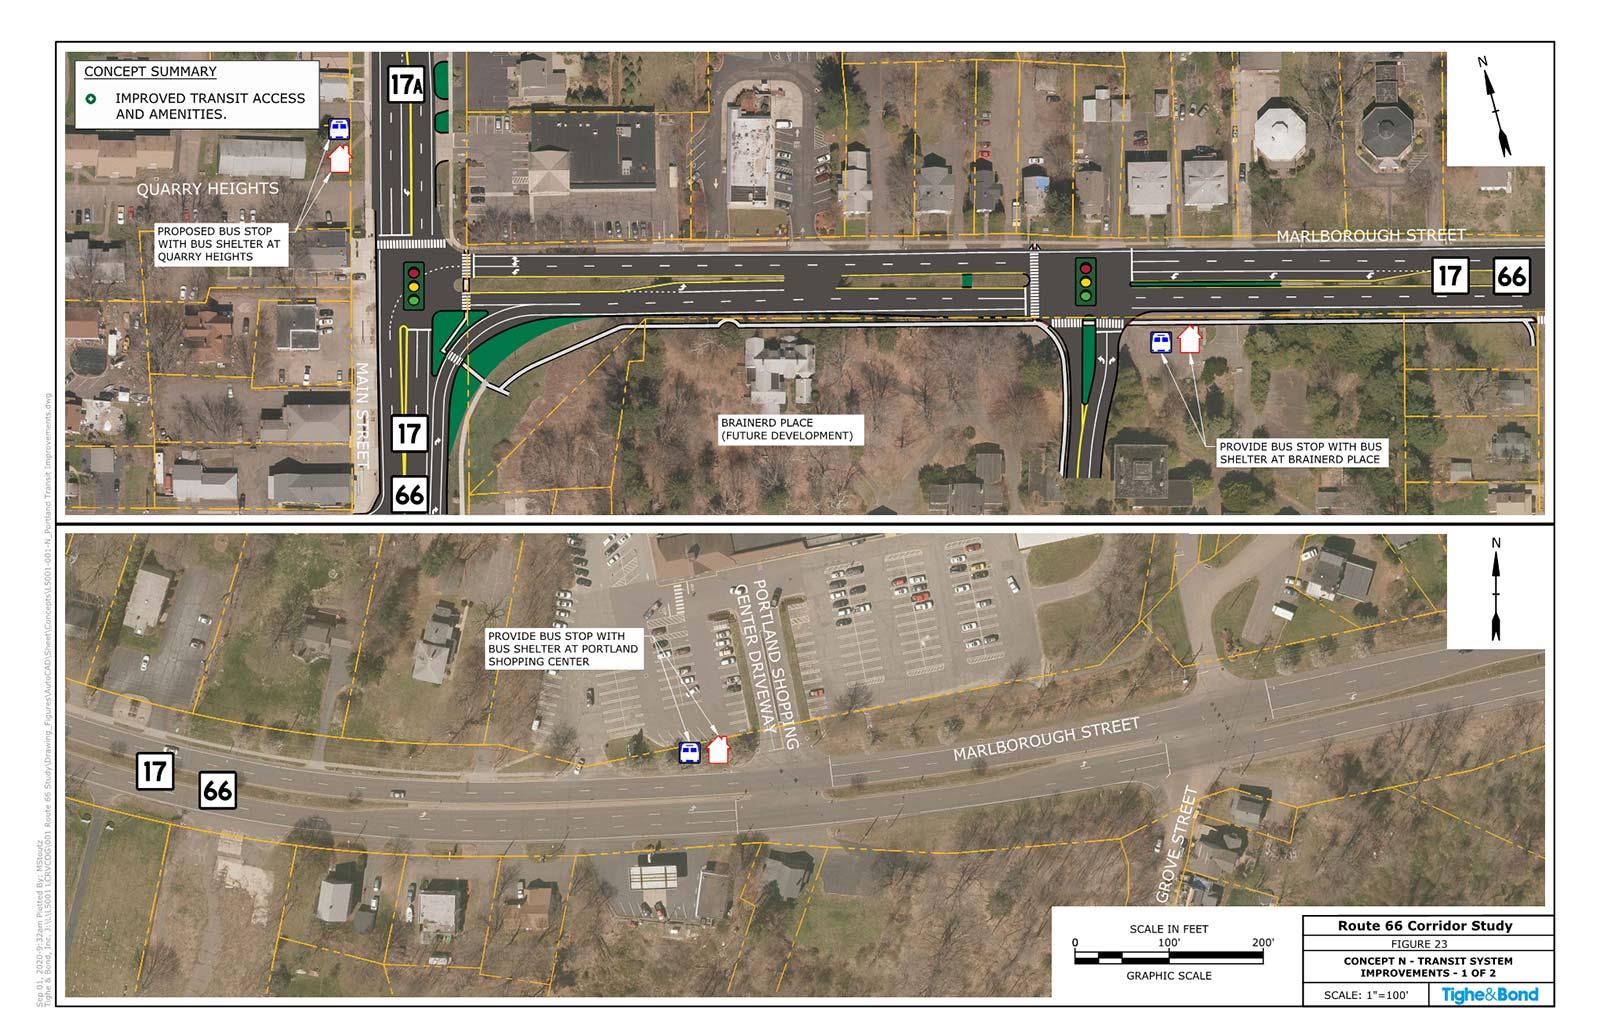 Transit Improvements (Concept N). Route 66 Transportation Study, Portland and East Hampton, CT.